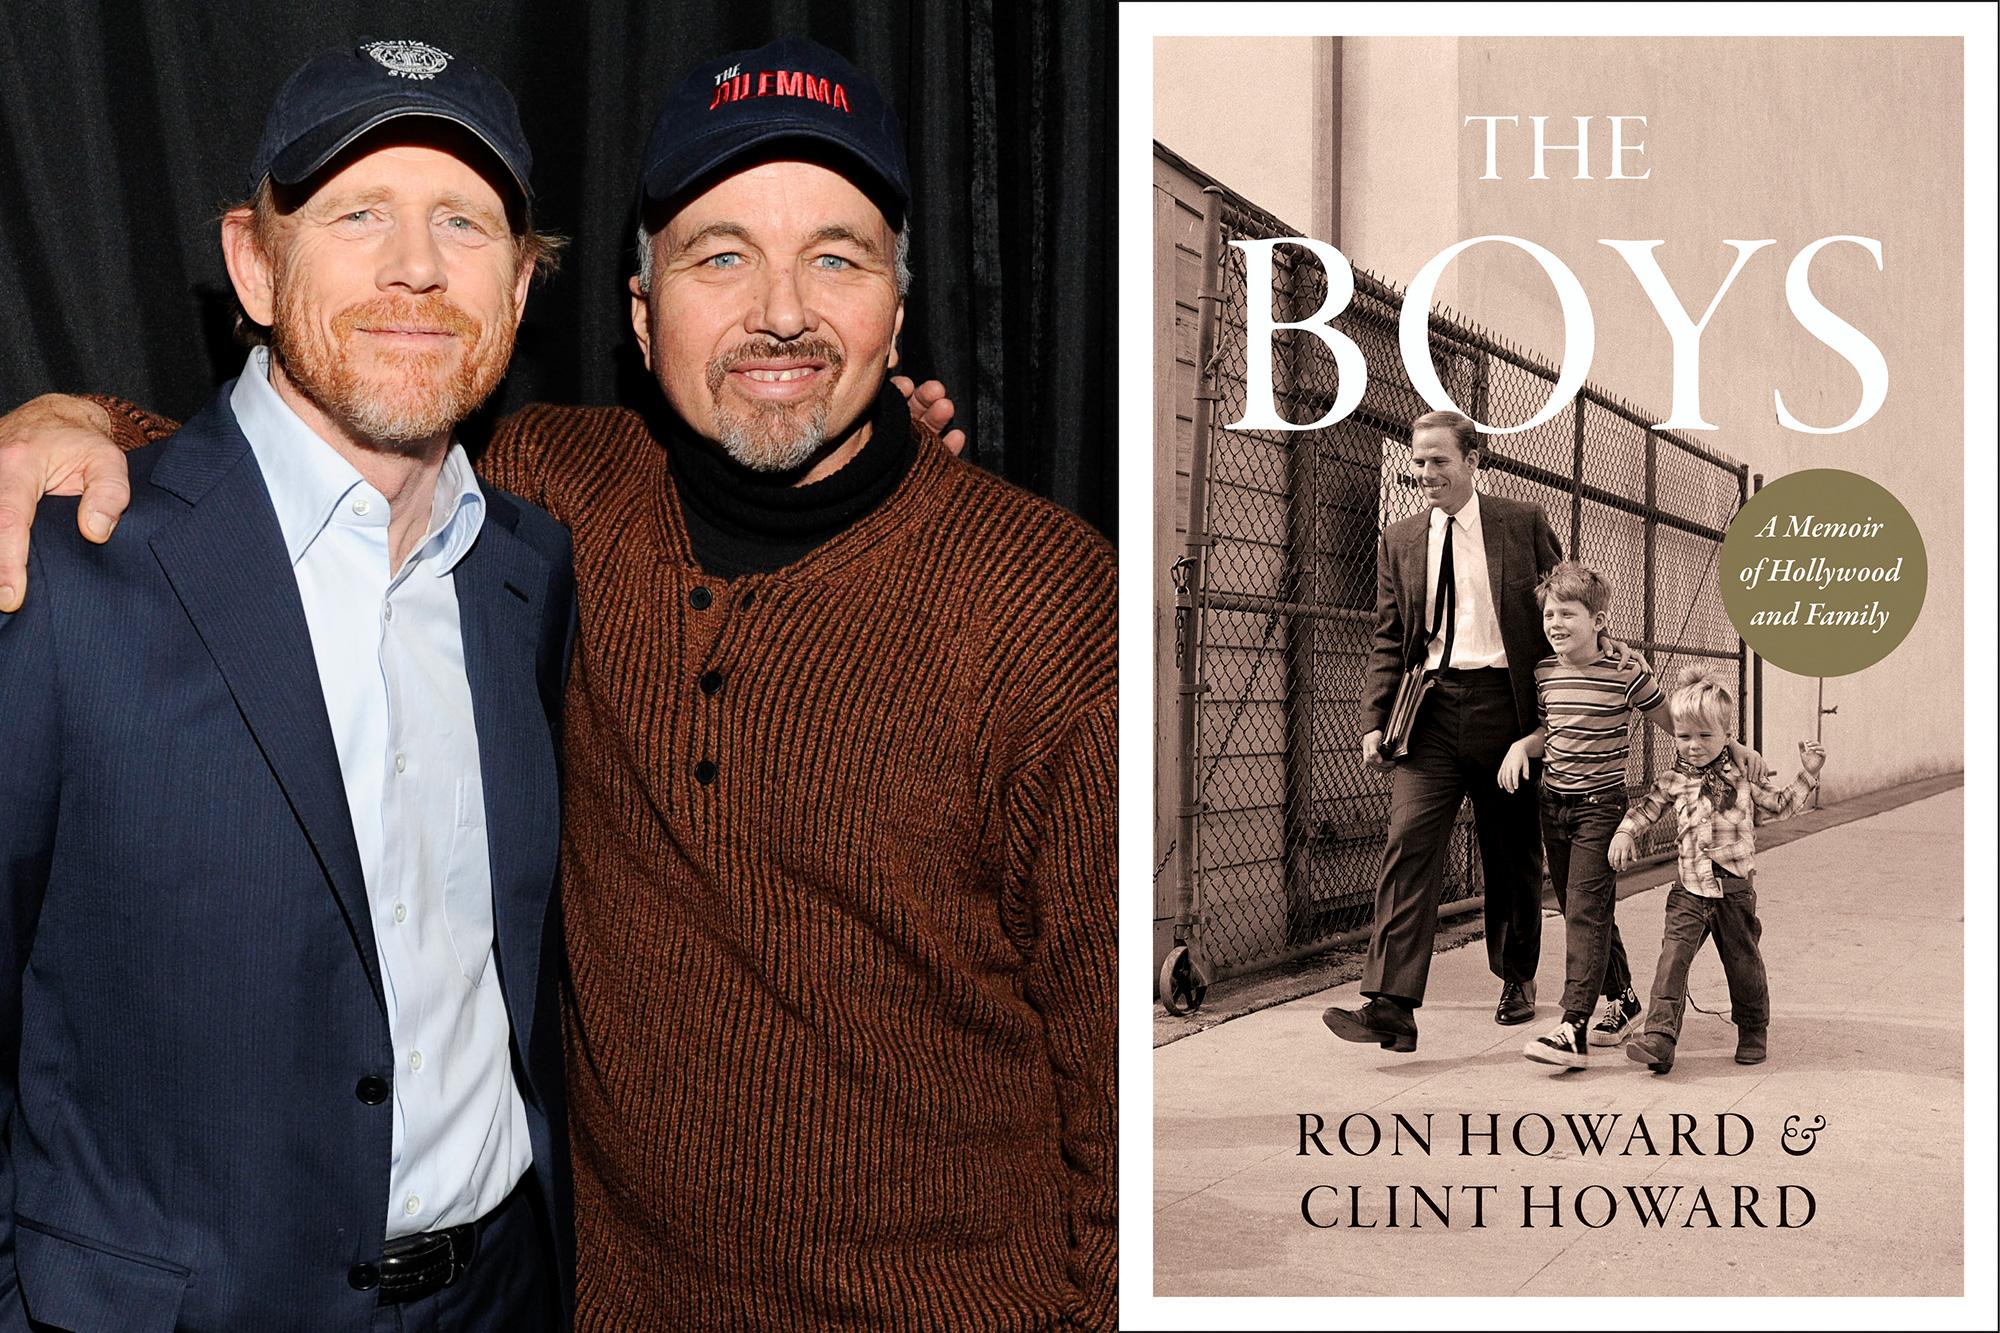 Ron Howard and Clint Howard, HarperCollins